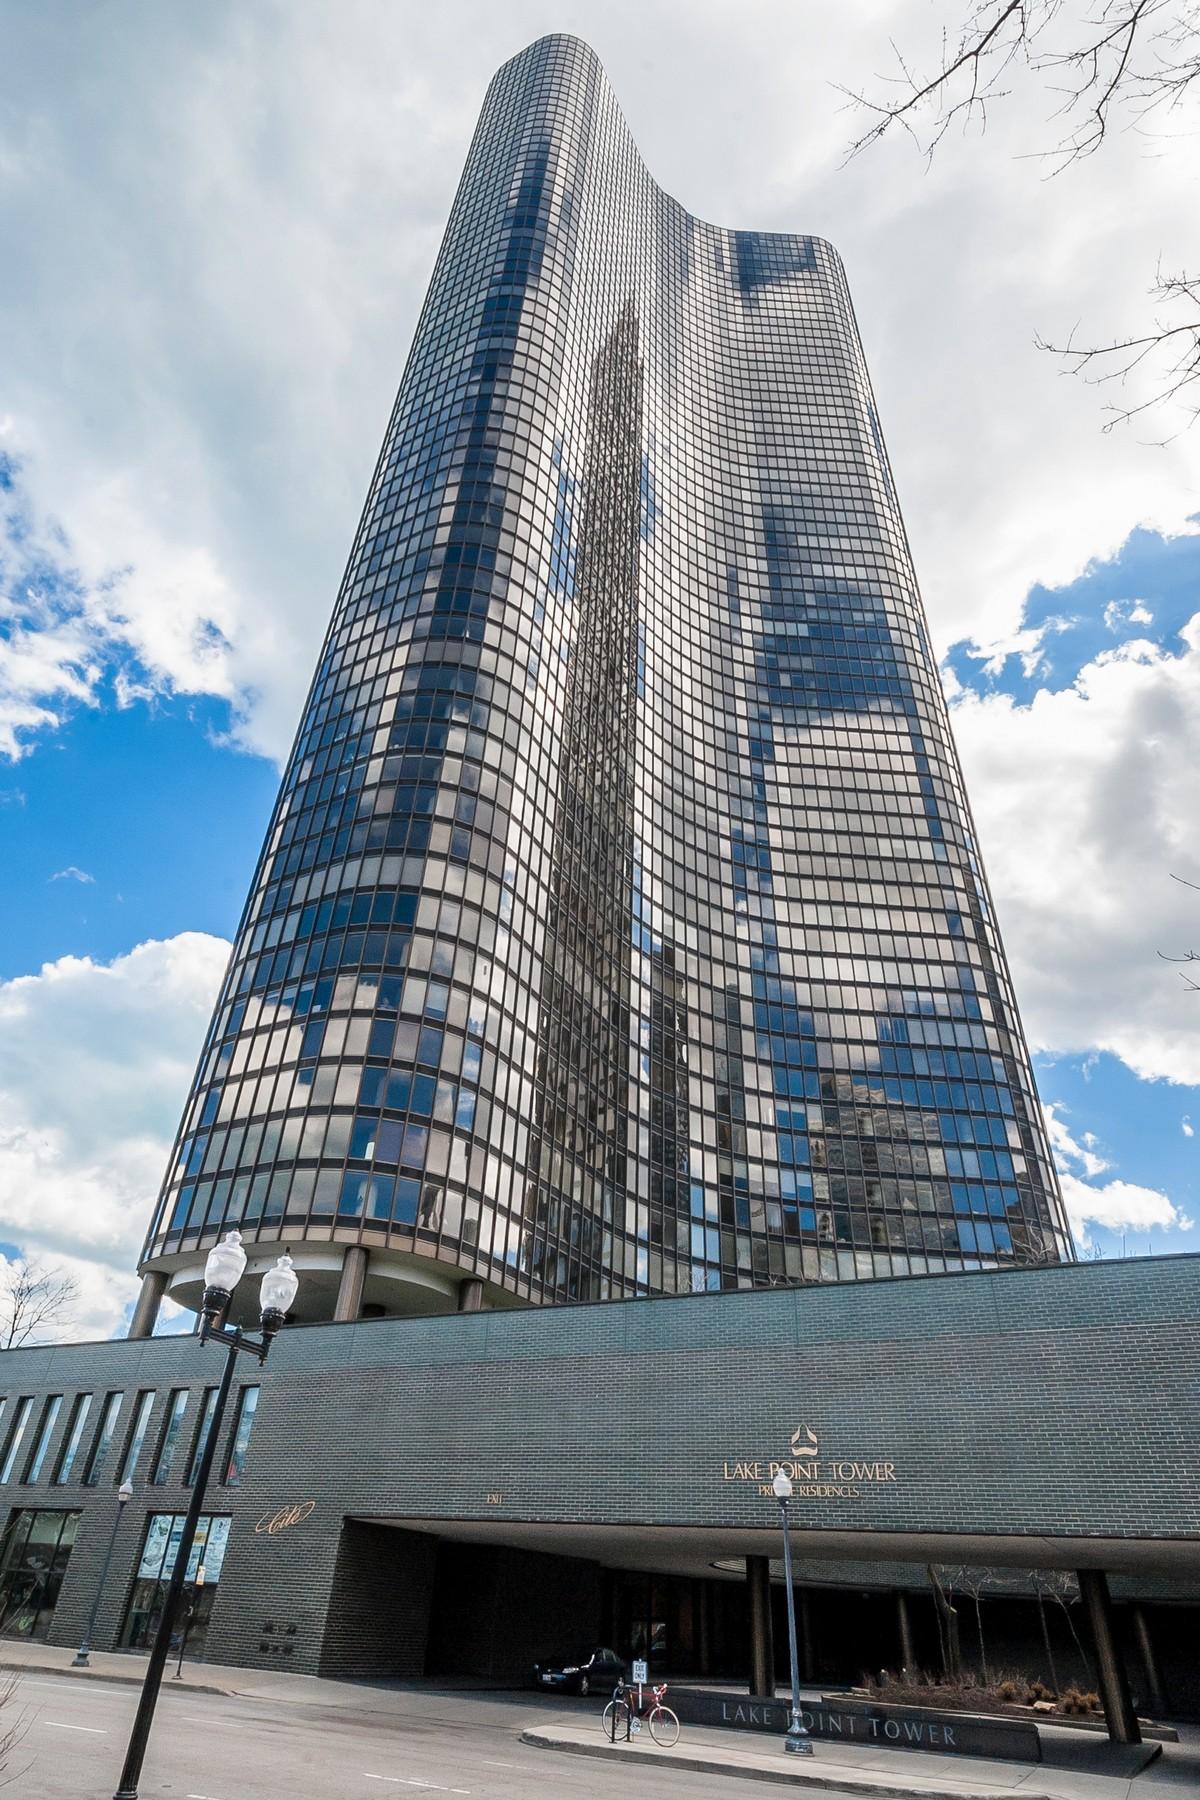 Kat Mülkiyeti için Satış at Expansive Condo in Highly Sought-After Lake Point Tower! 505 N Lake Shore Drive Unit 1306 Near North Side, Chicago, Illinois, 60611 Amerika Birleşik Devletleri